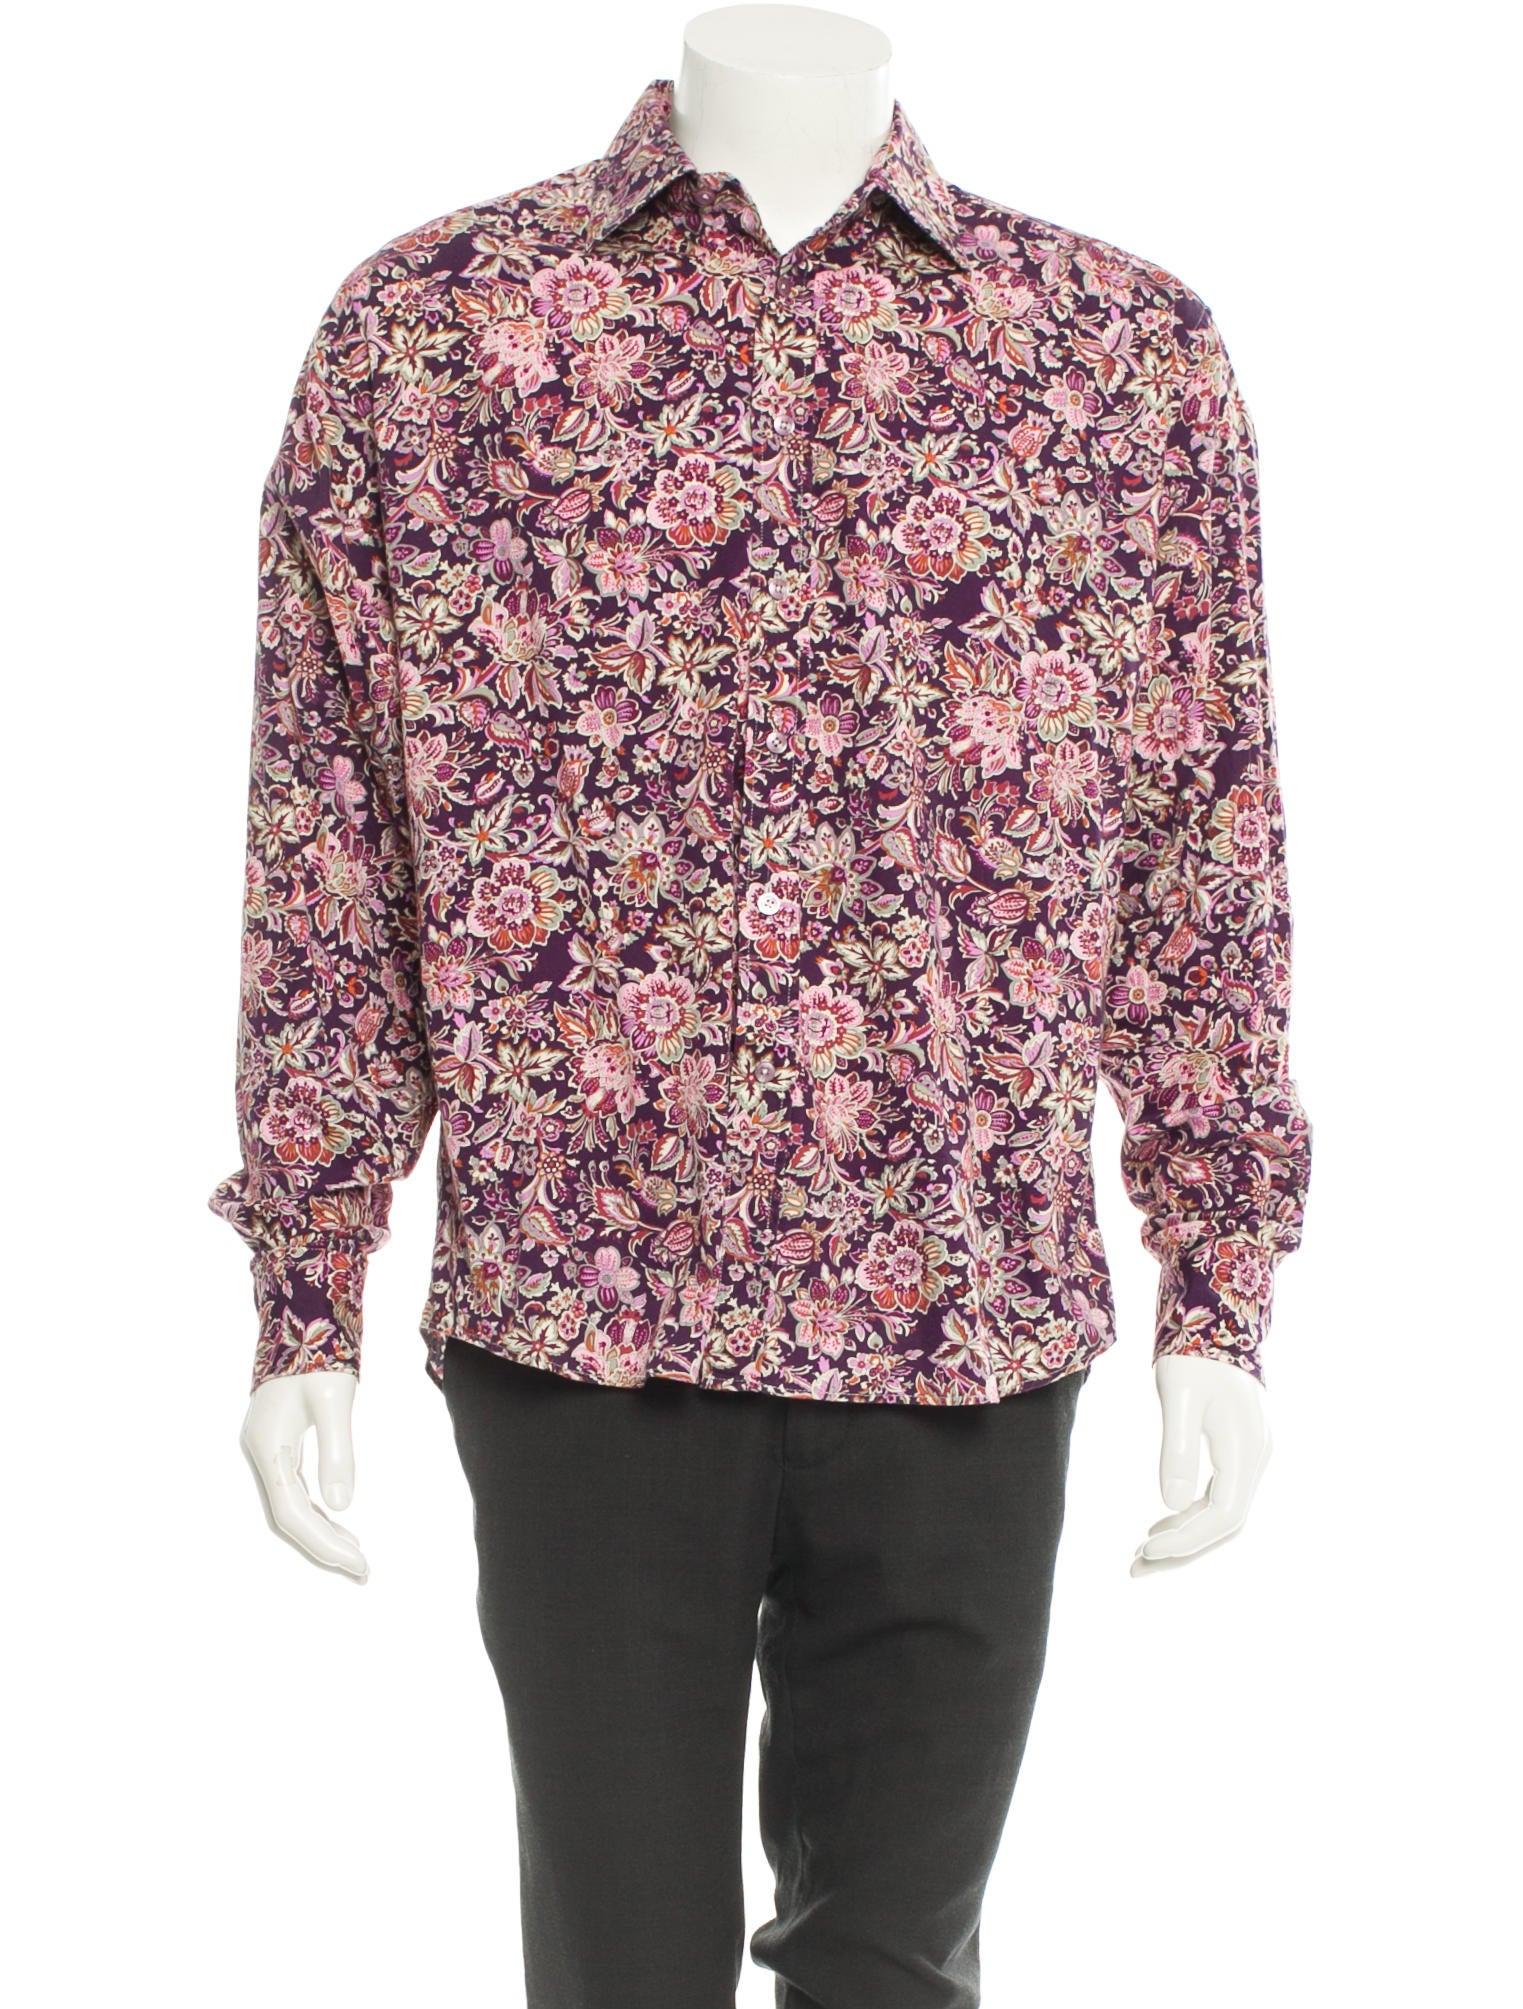 Paul smith floral print button up shirt mens shirts for Floral print button up shirt